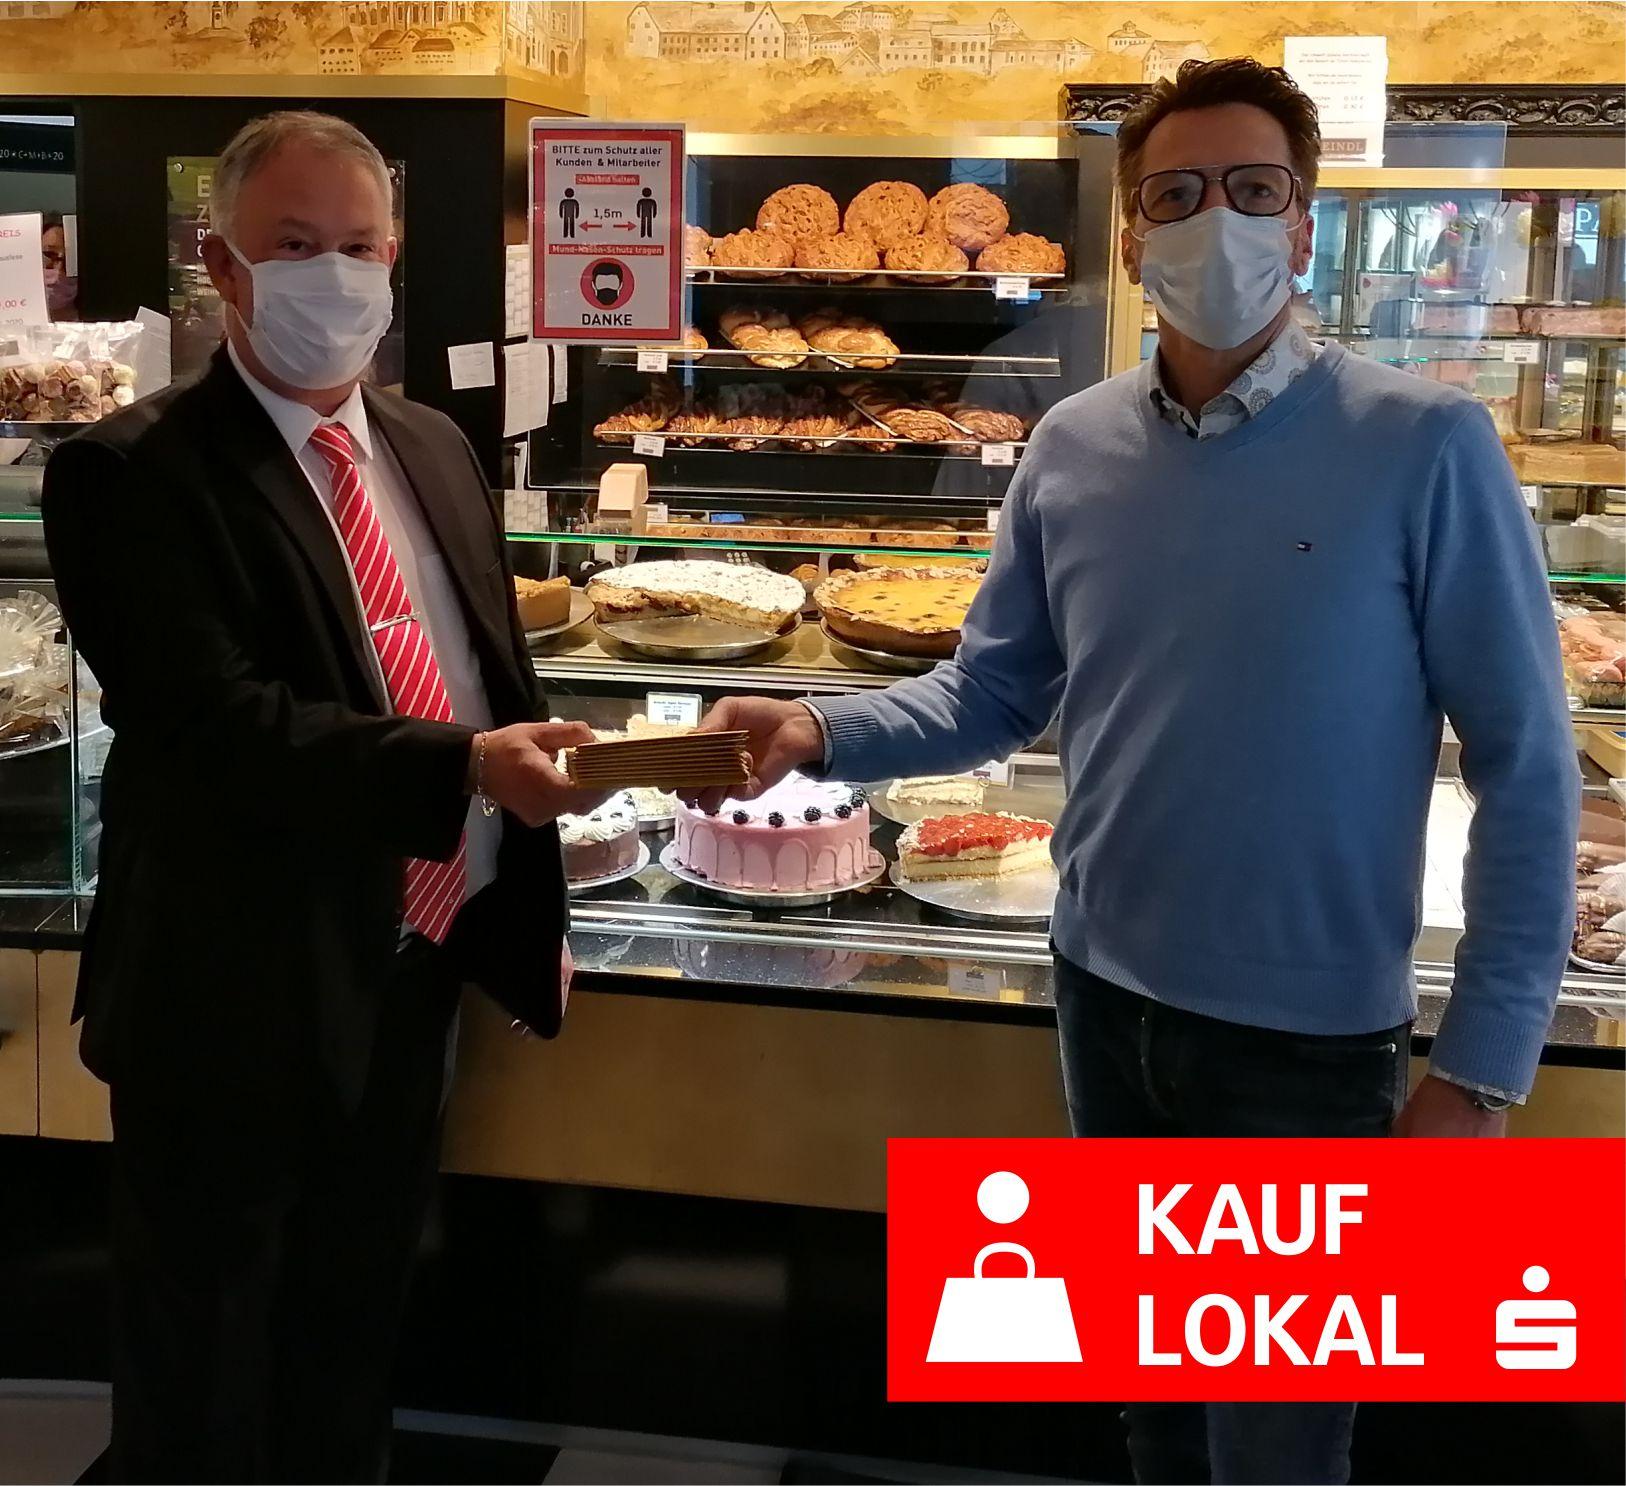 Greindl_Kauf-lokal